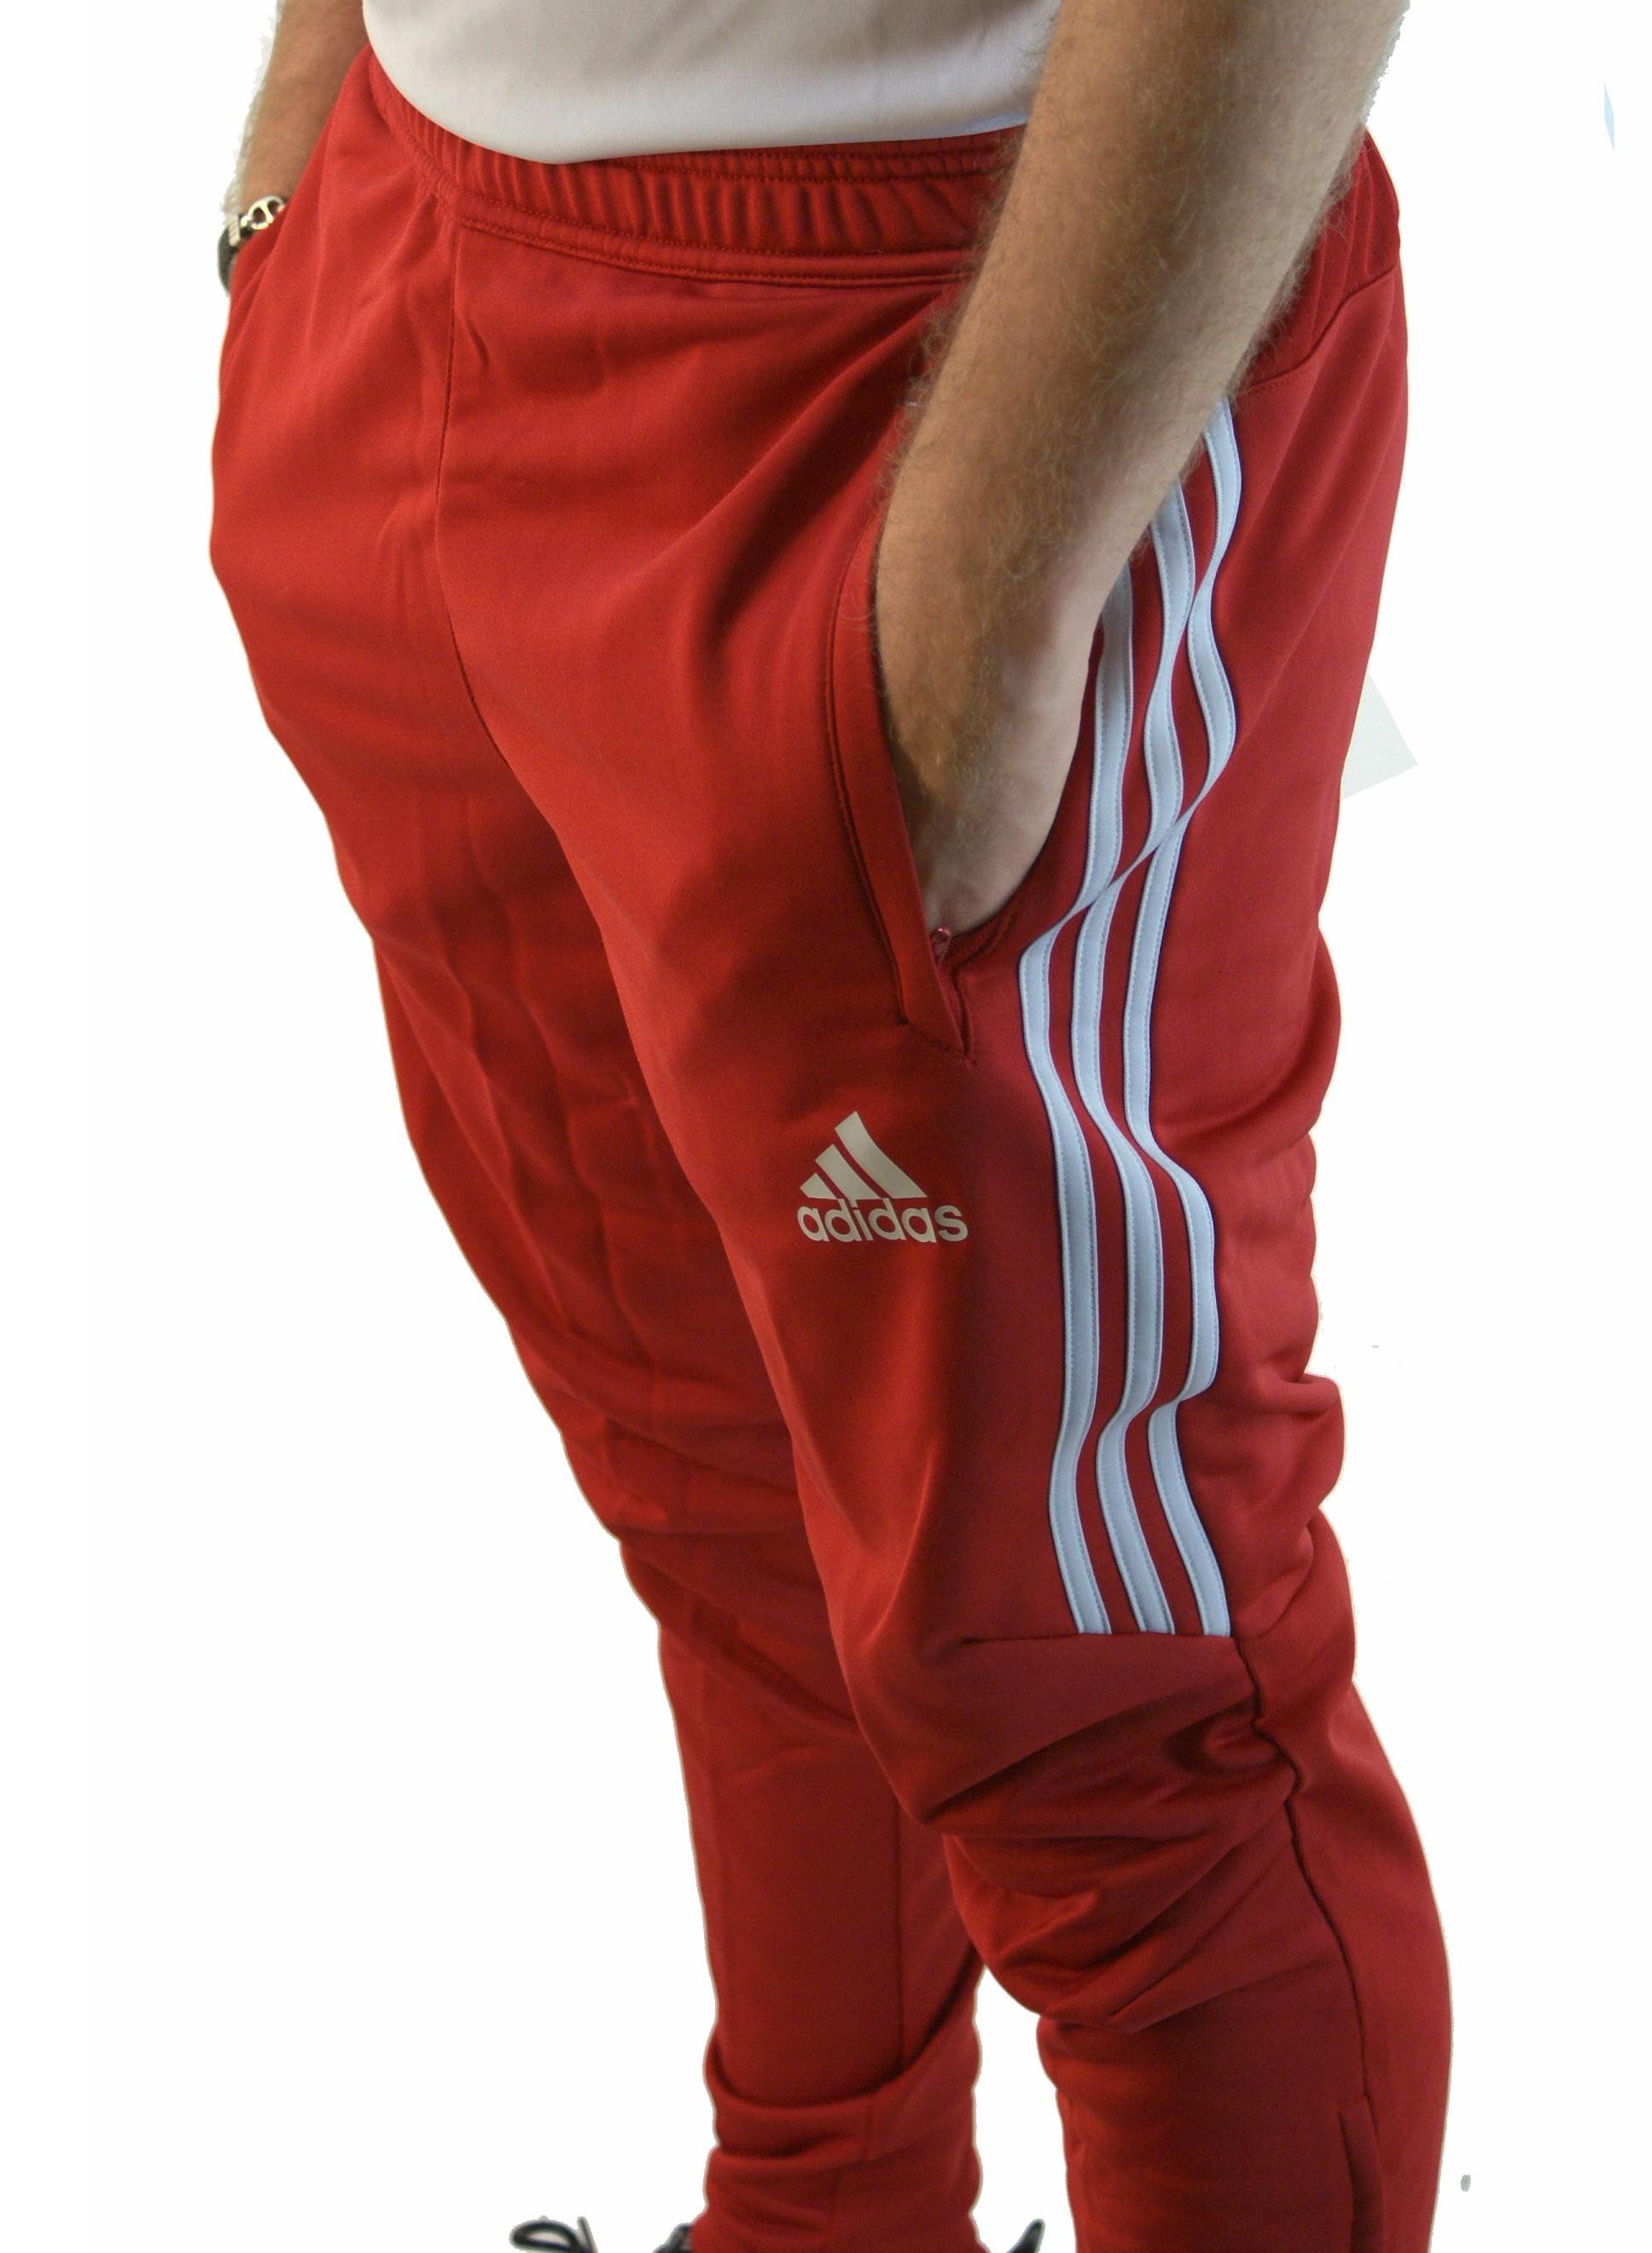 Pantalon Adidas Hombre Rojo 52 Descuento Bosca Ec